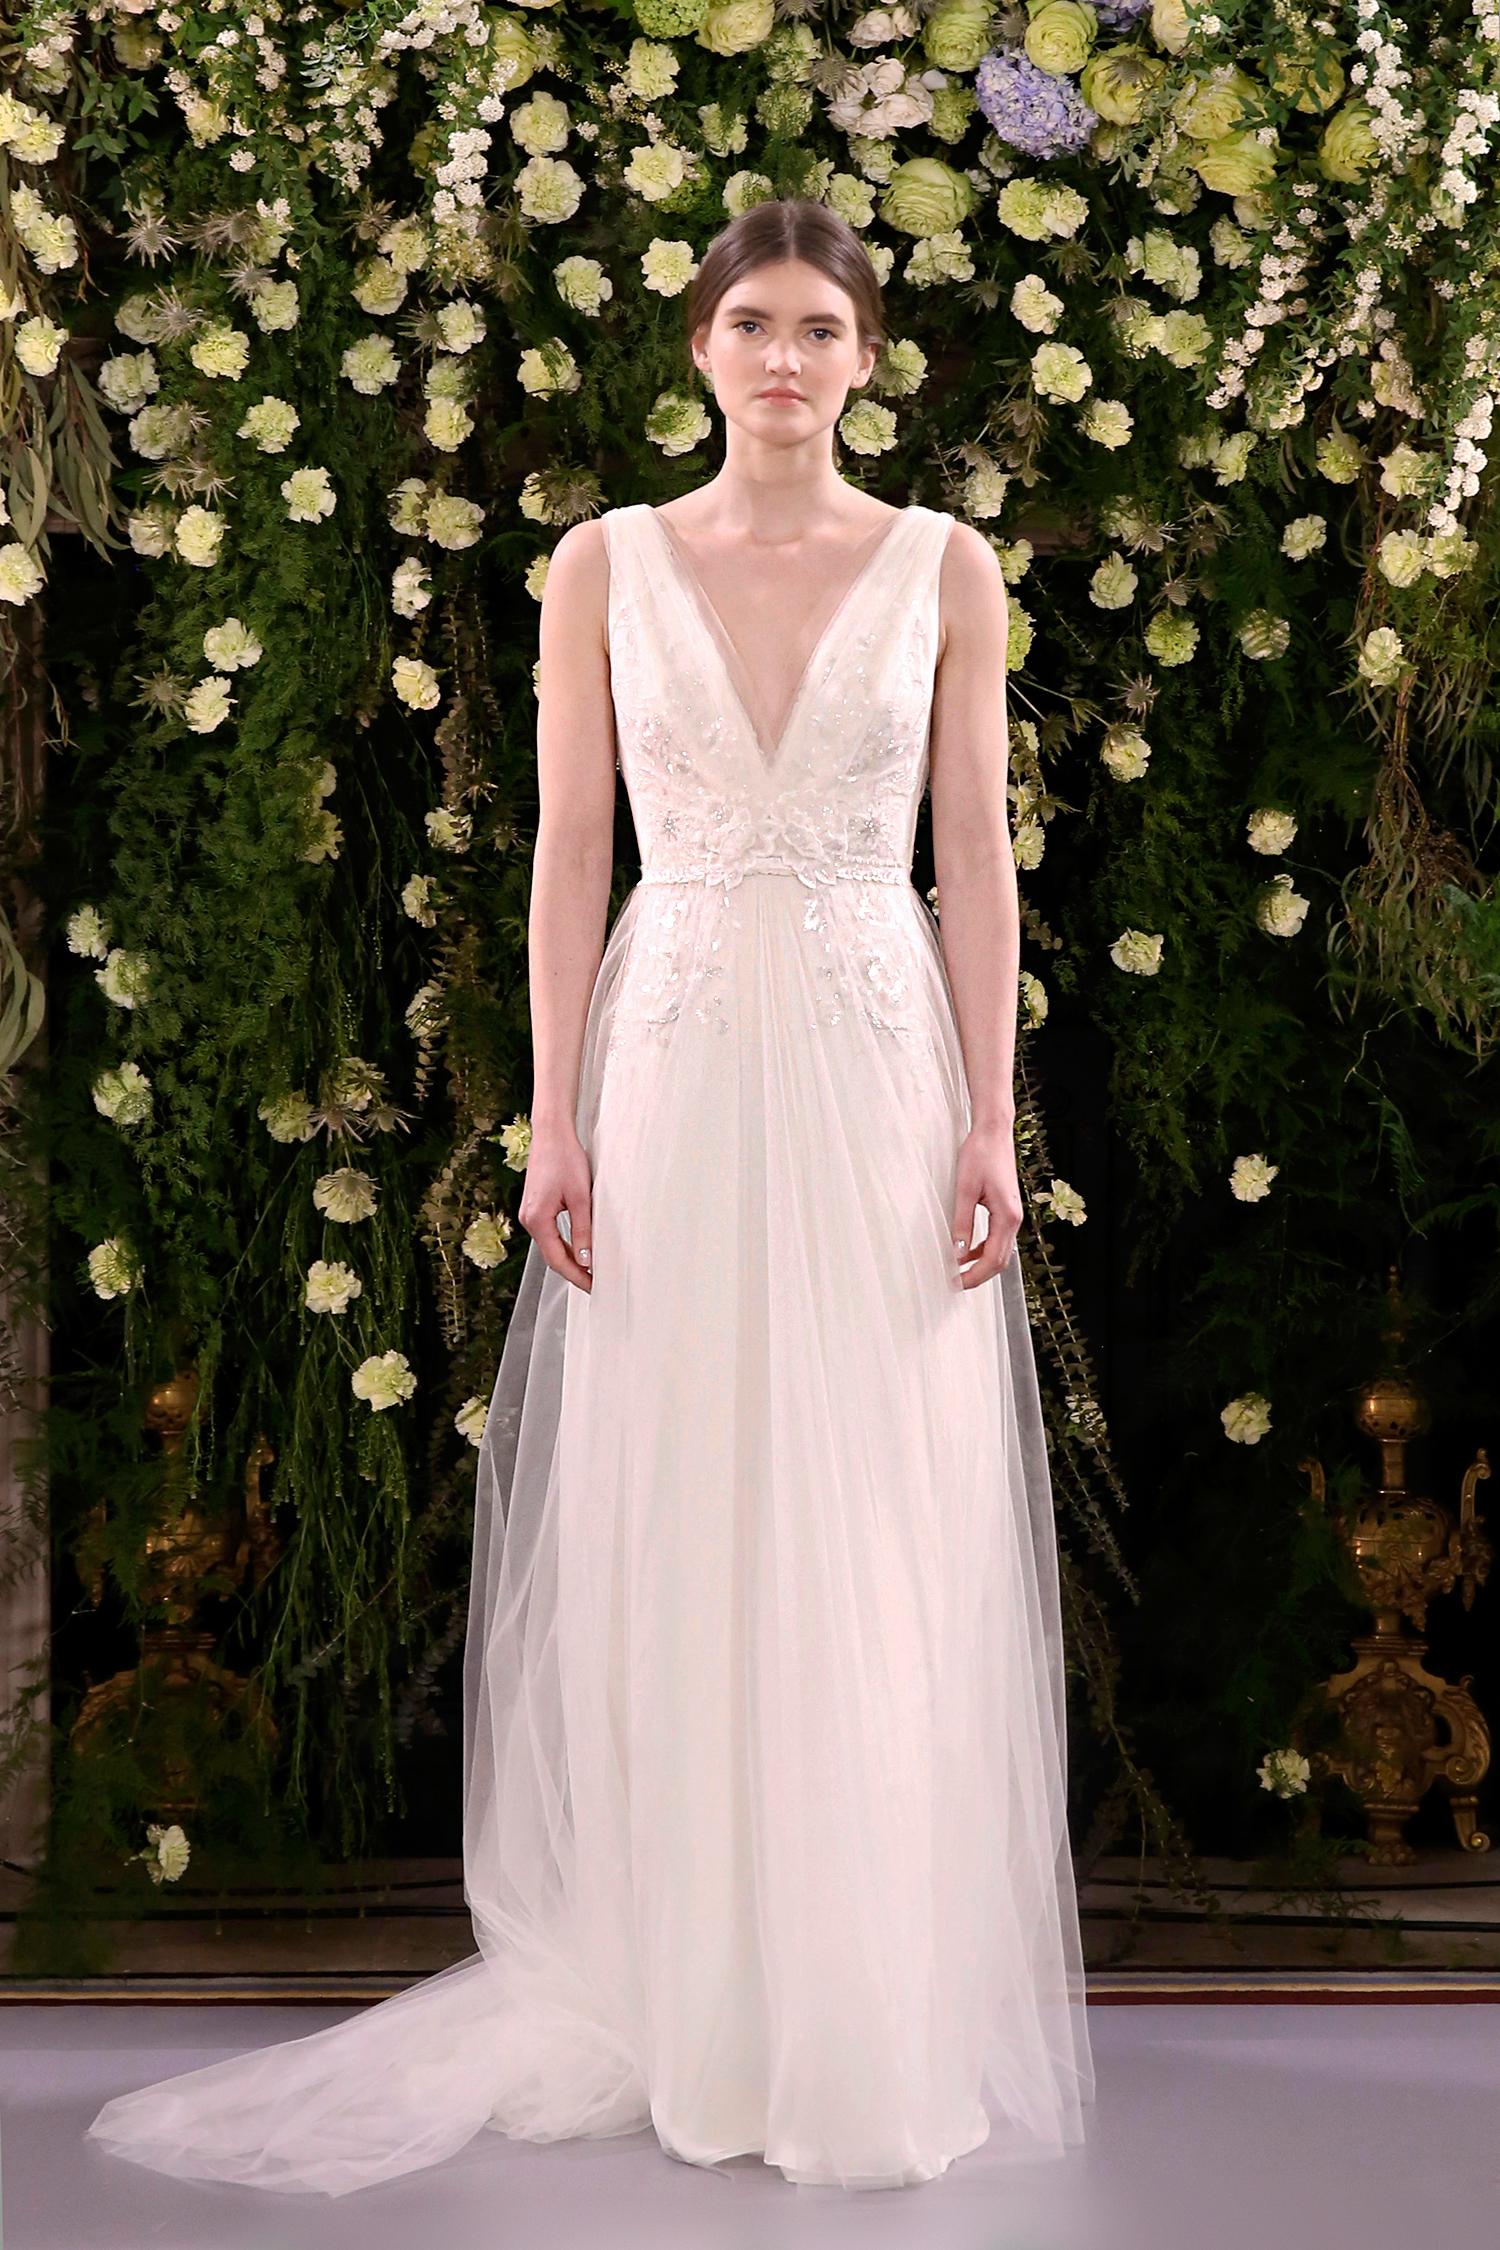 jenny packham wedding dress spring 2019 v-neck with tulle